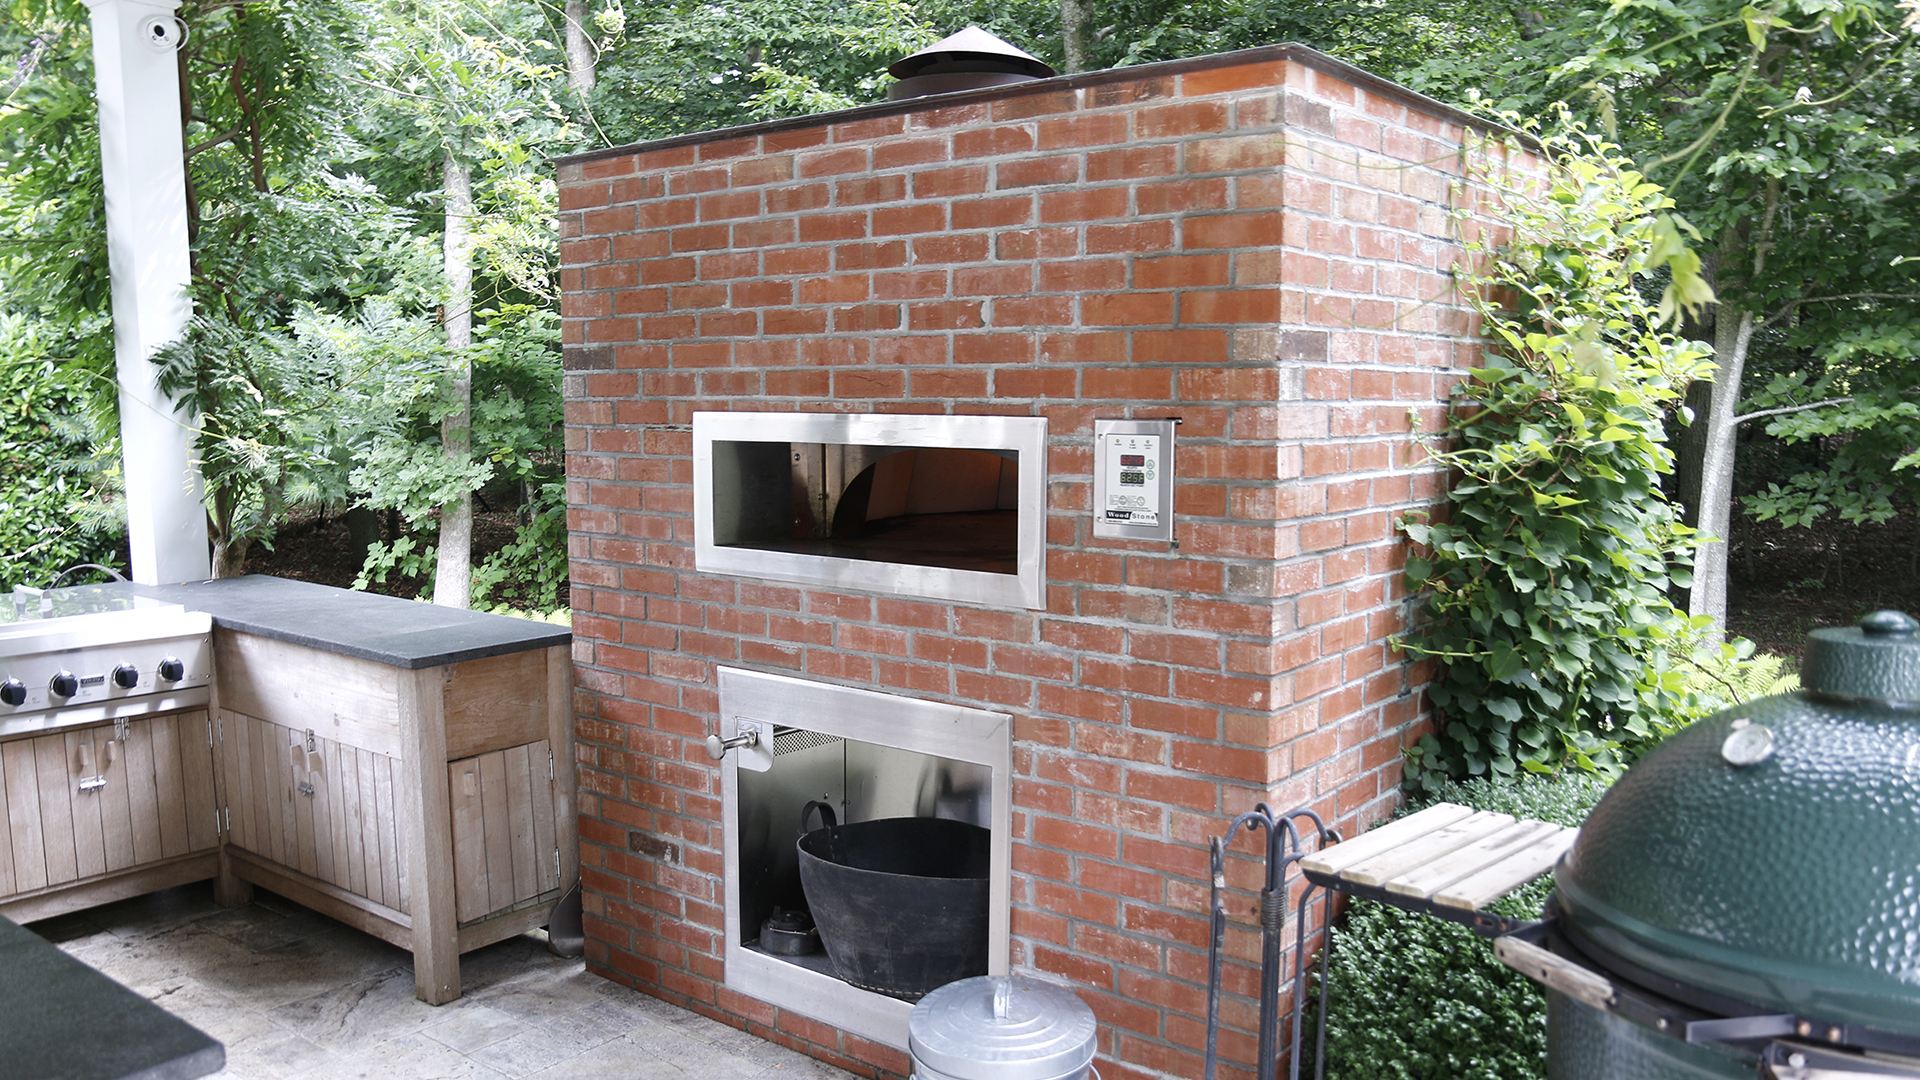 Bobby Flay S Amagansett House Has An Outdoor Kitchen Pizza Oven